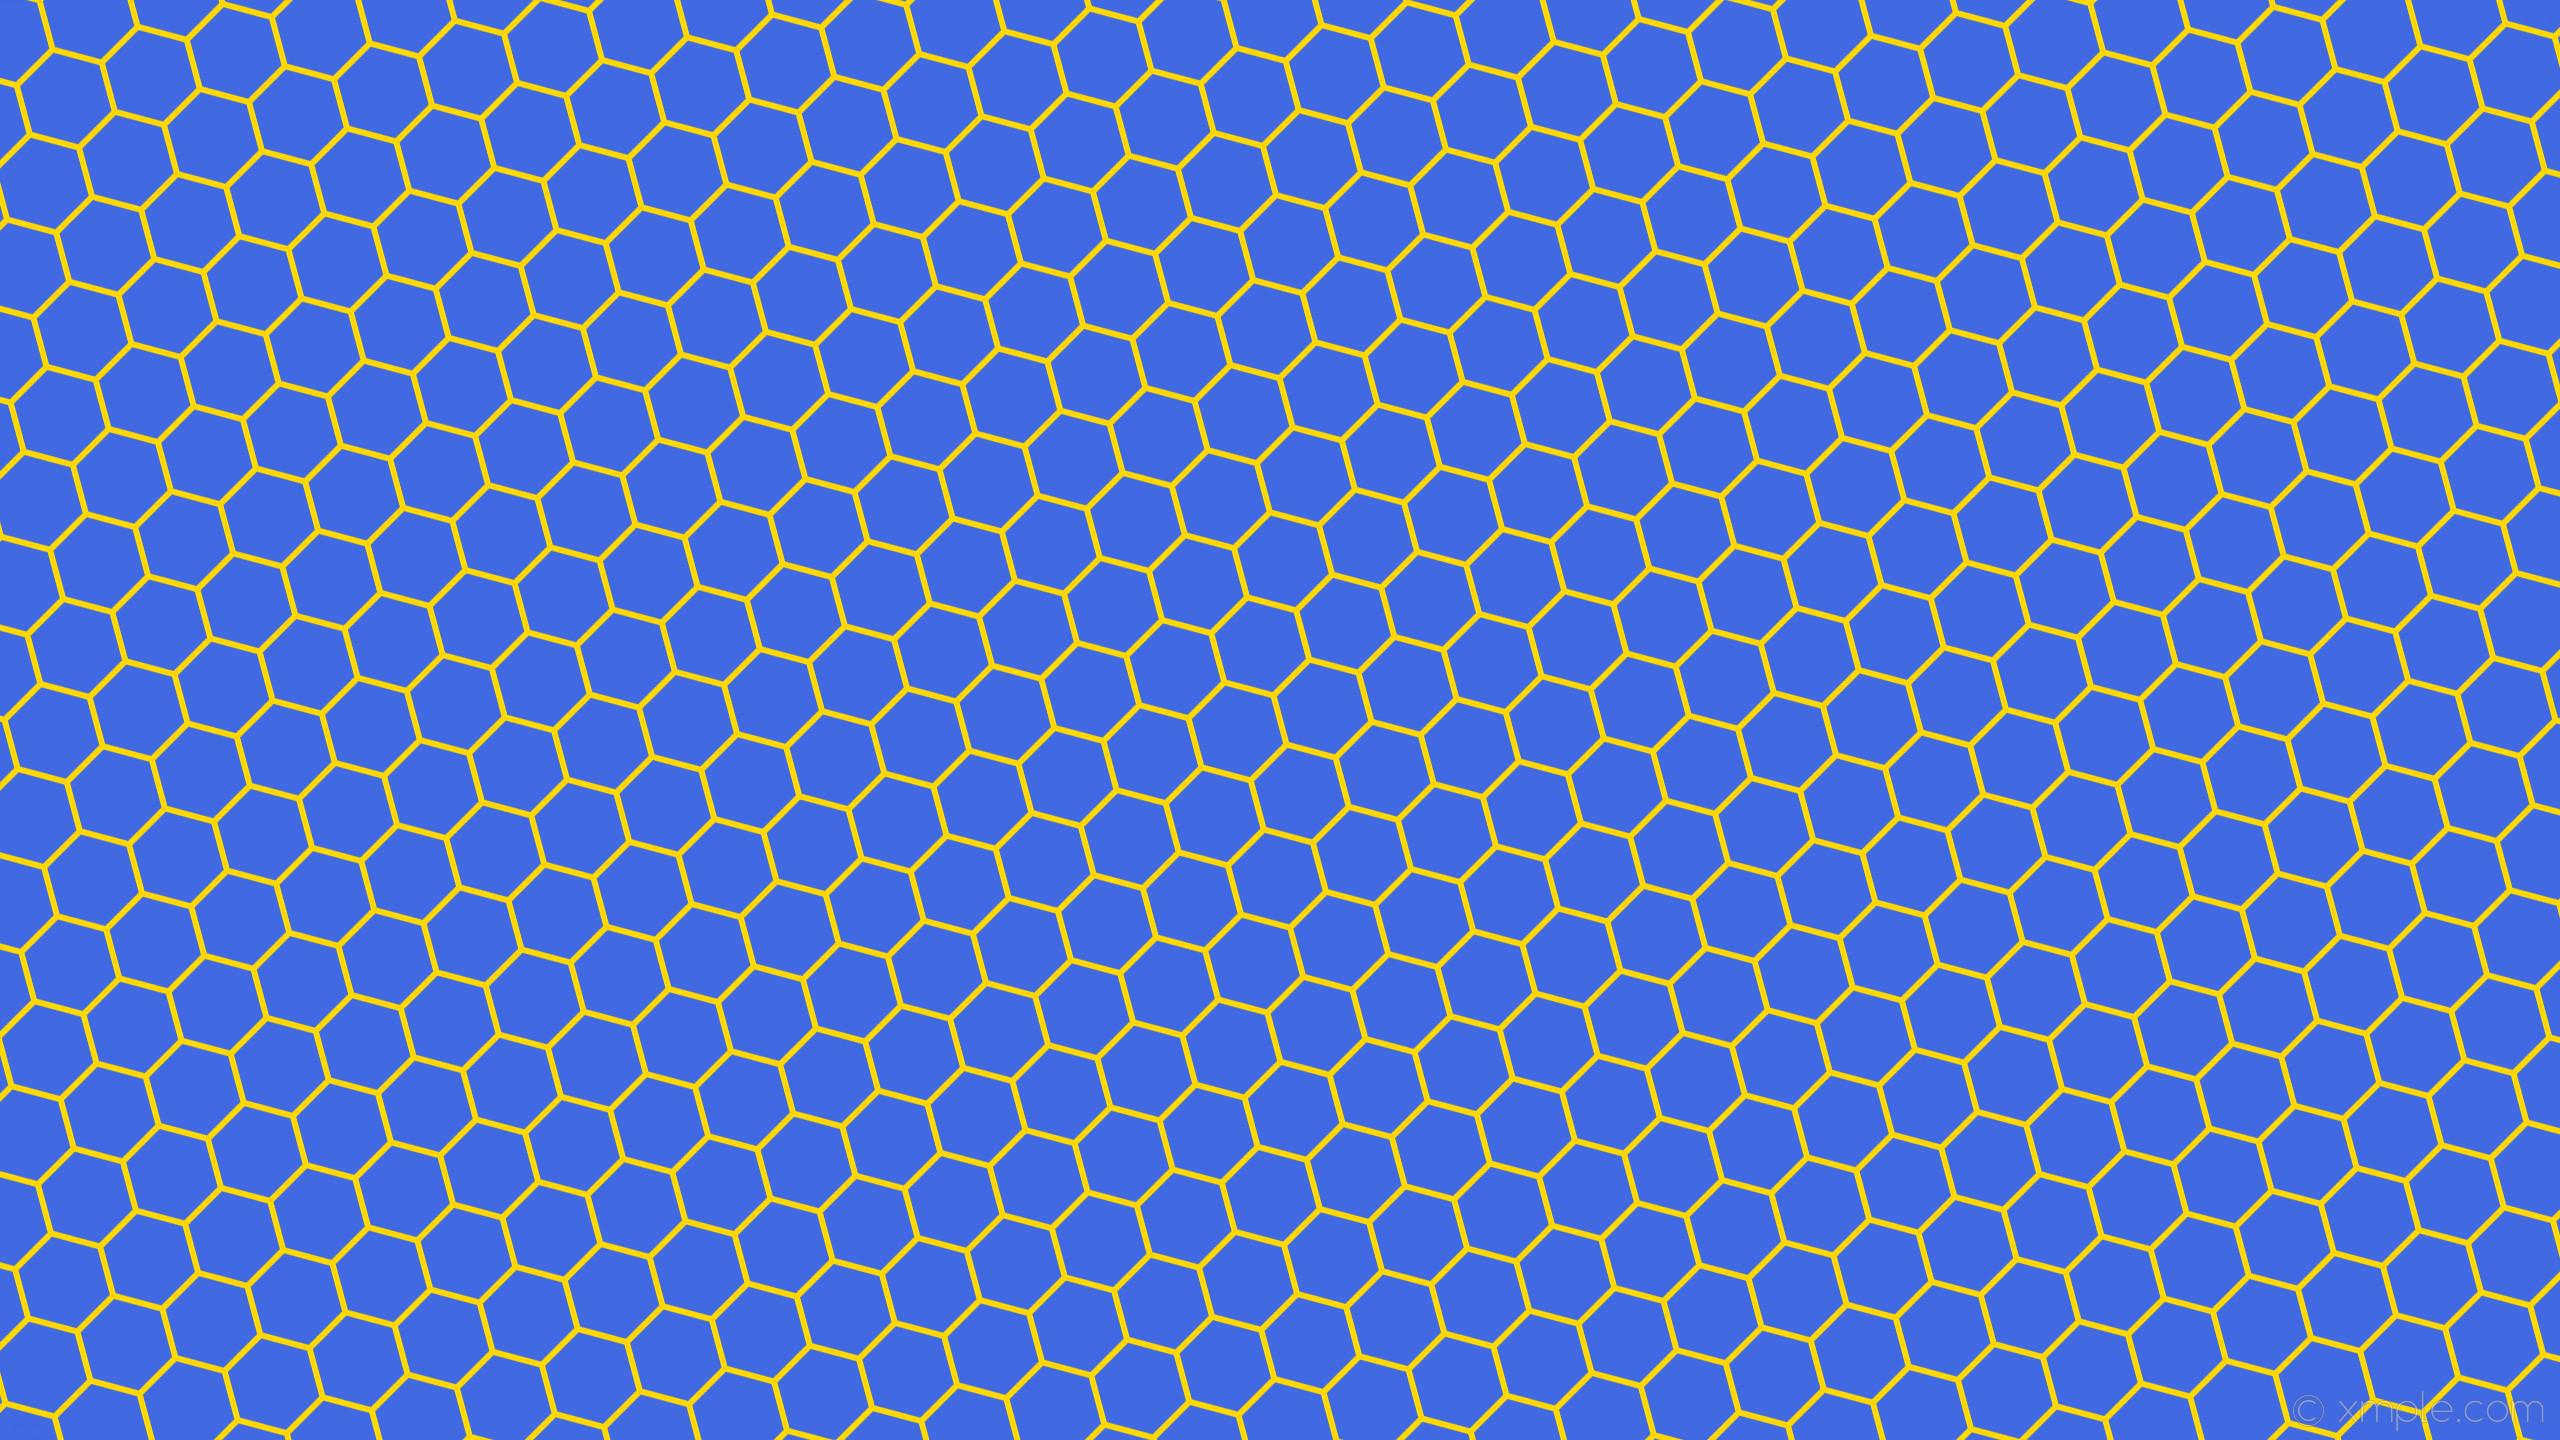 wallpaper yellow hexagon beehive honeycomb blue royal blue gold #4169e1  #ffd700 diagonal 15°